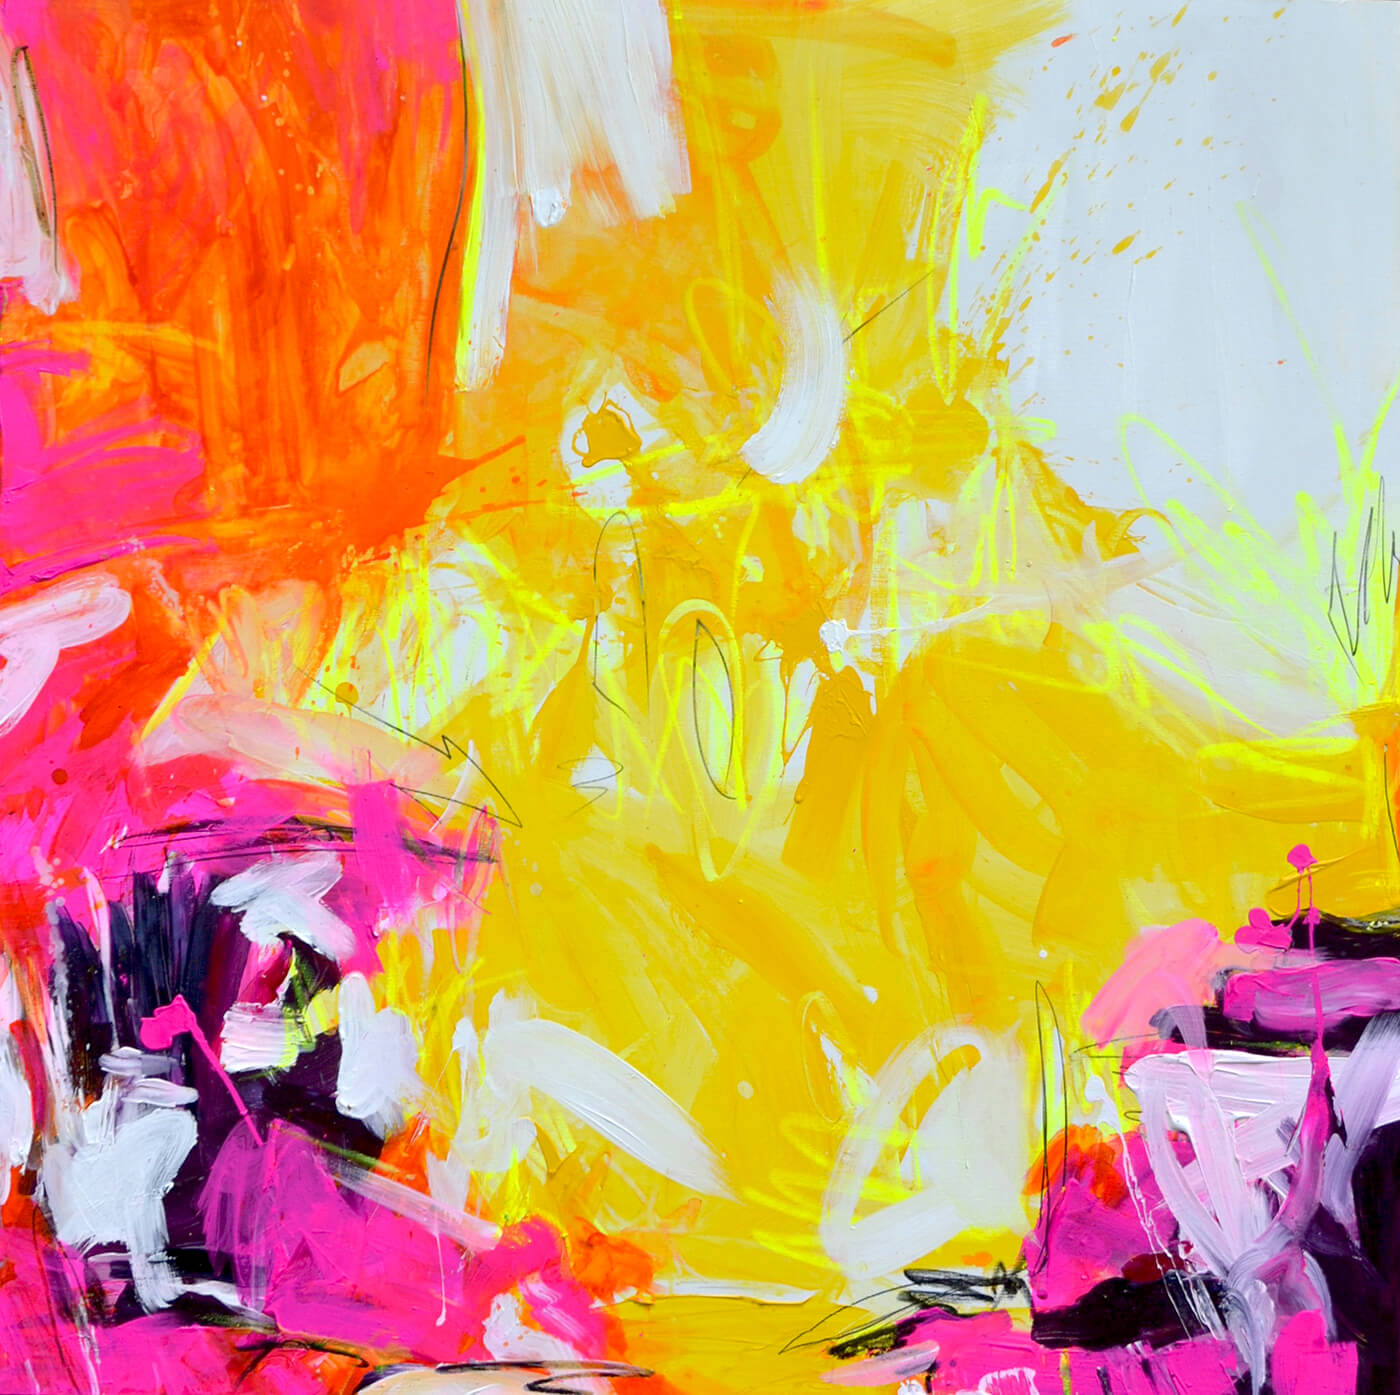 Essenz I AM abstrakte informelle Kunst Petronilla Hohenwarter Künstlerin Bali